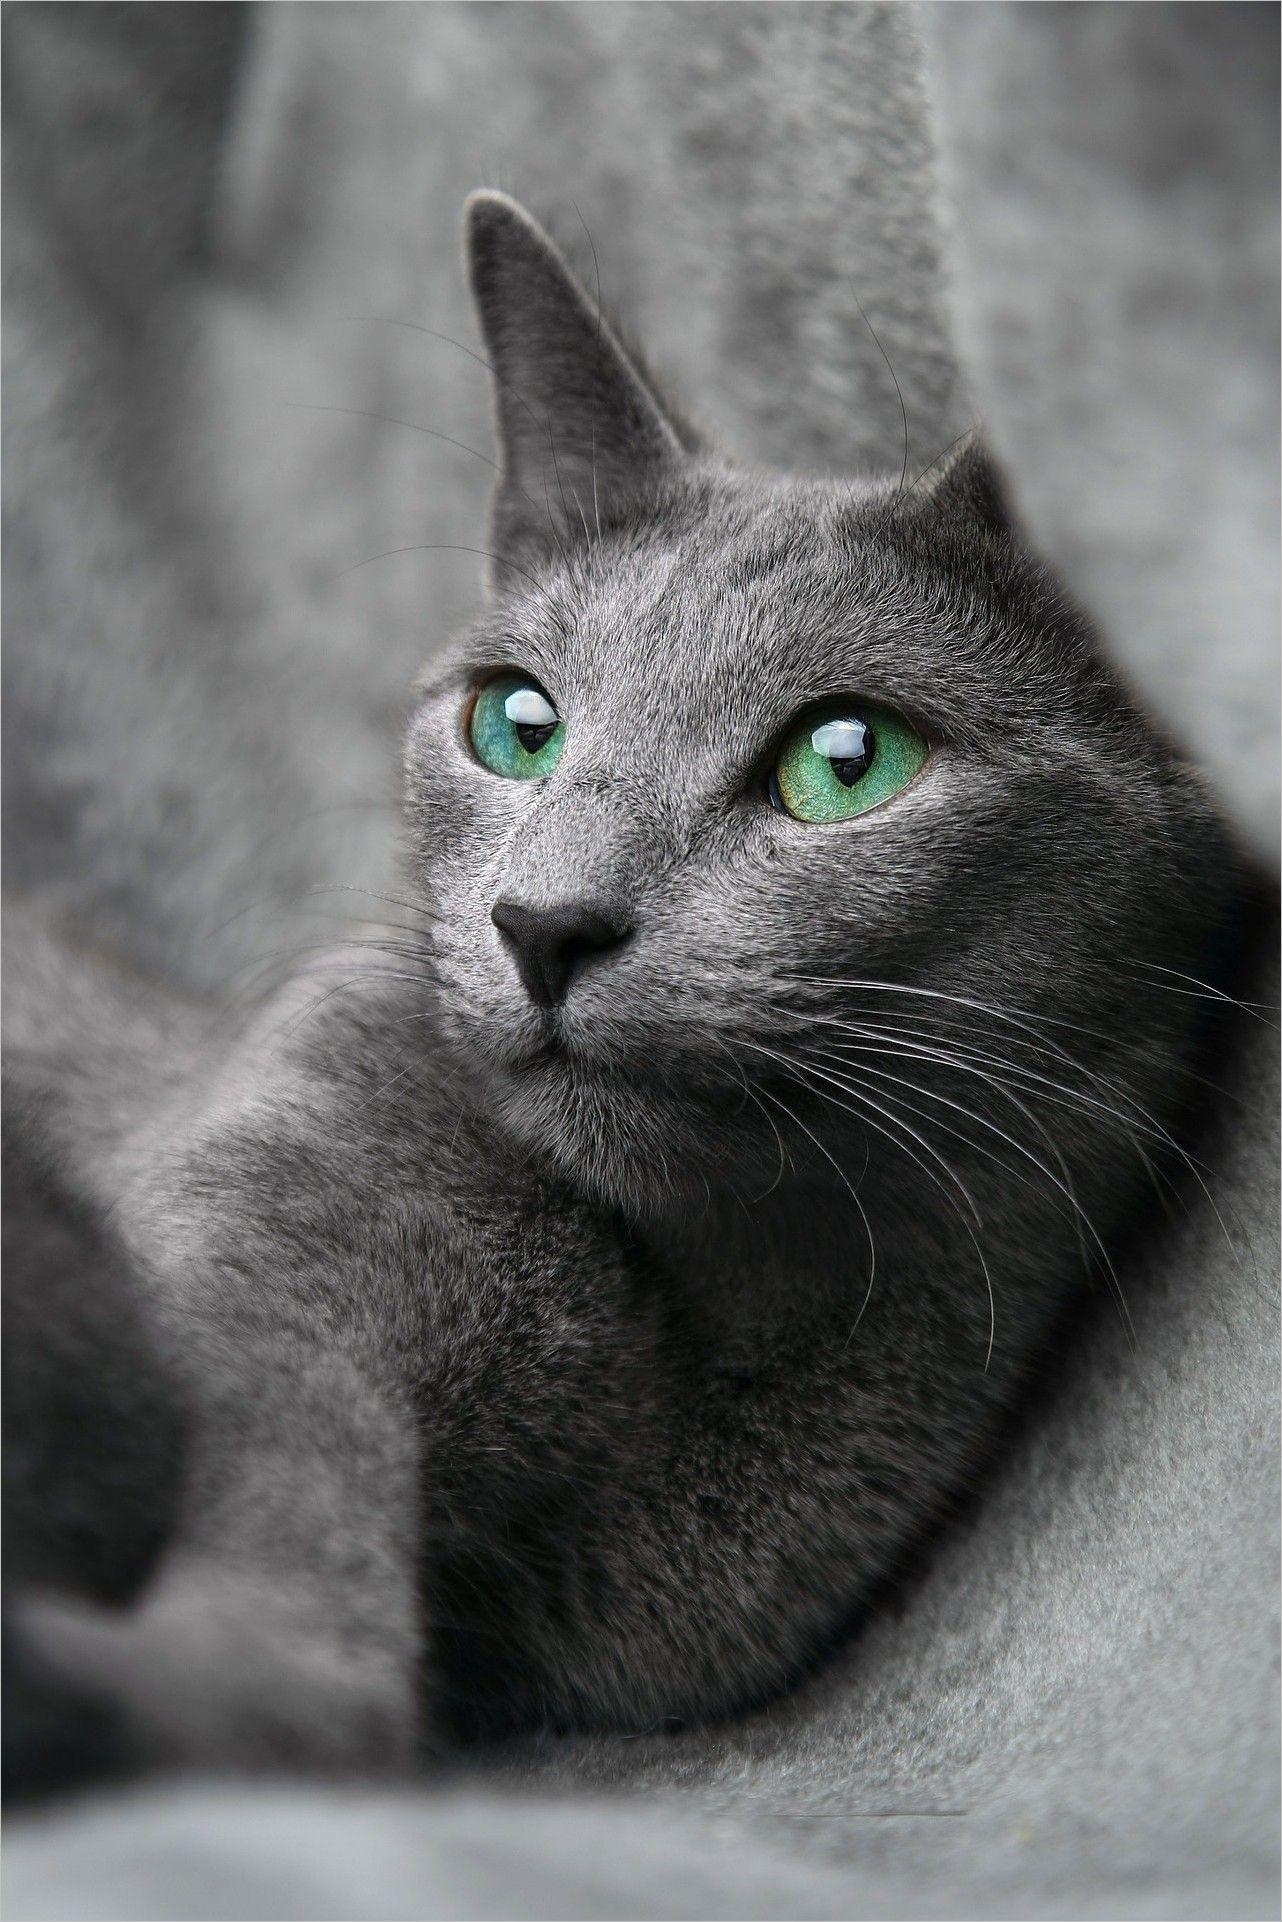 Cat Wallpaper Img Pictures Cat Eyes Cat Russian Blue Look Eyes Gray Pet Animal Gato Azul Ruso El Gato Azul Azul Ruso